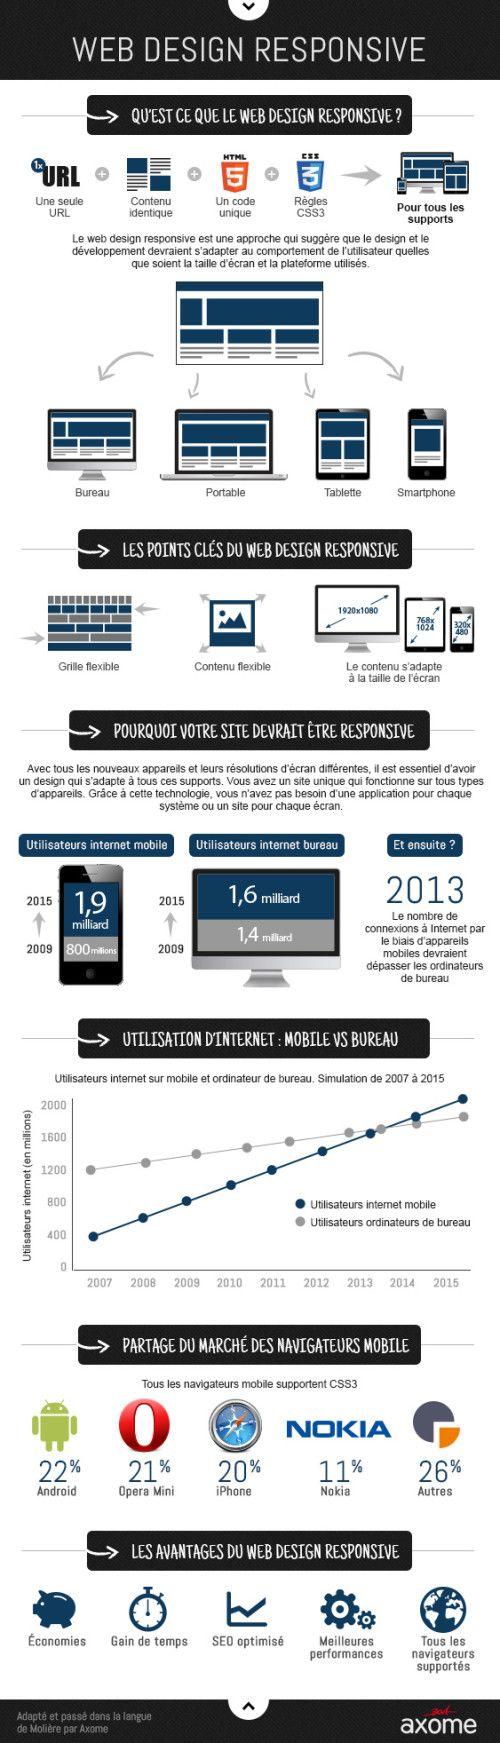 Web Responsive Design - 2013